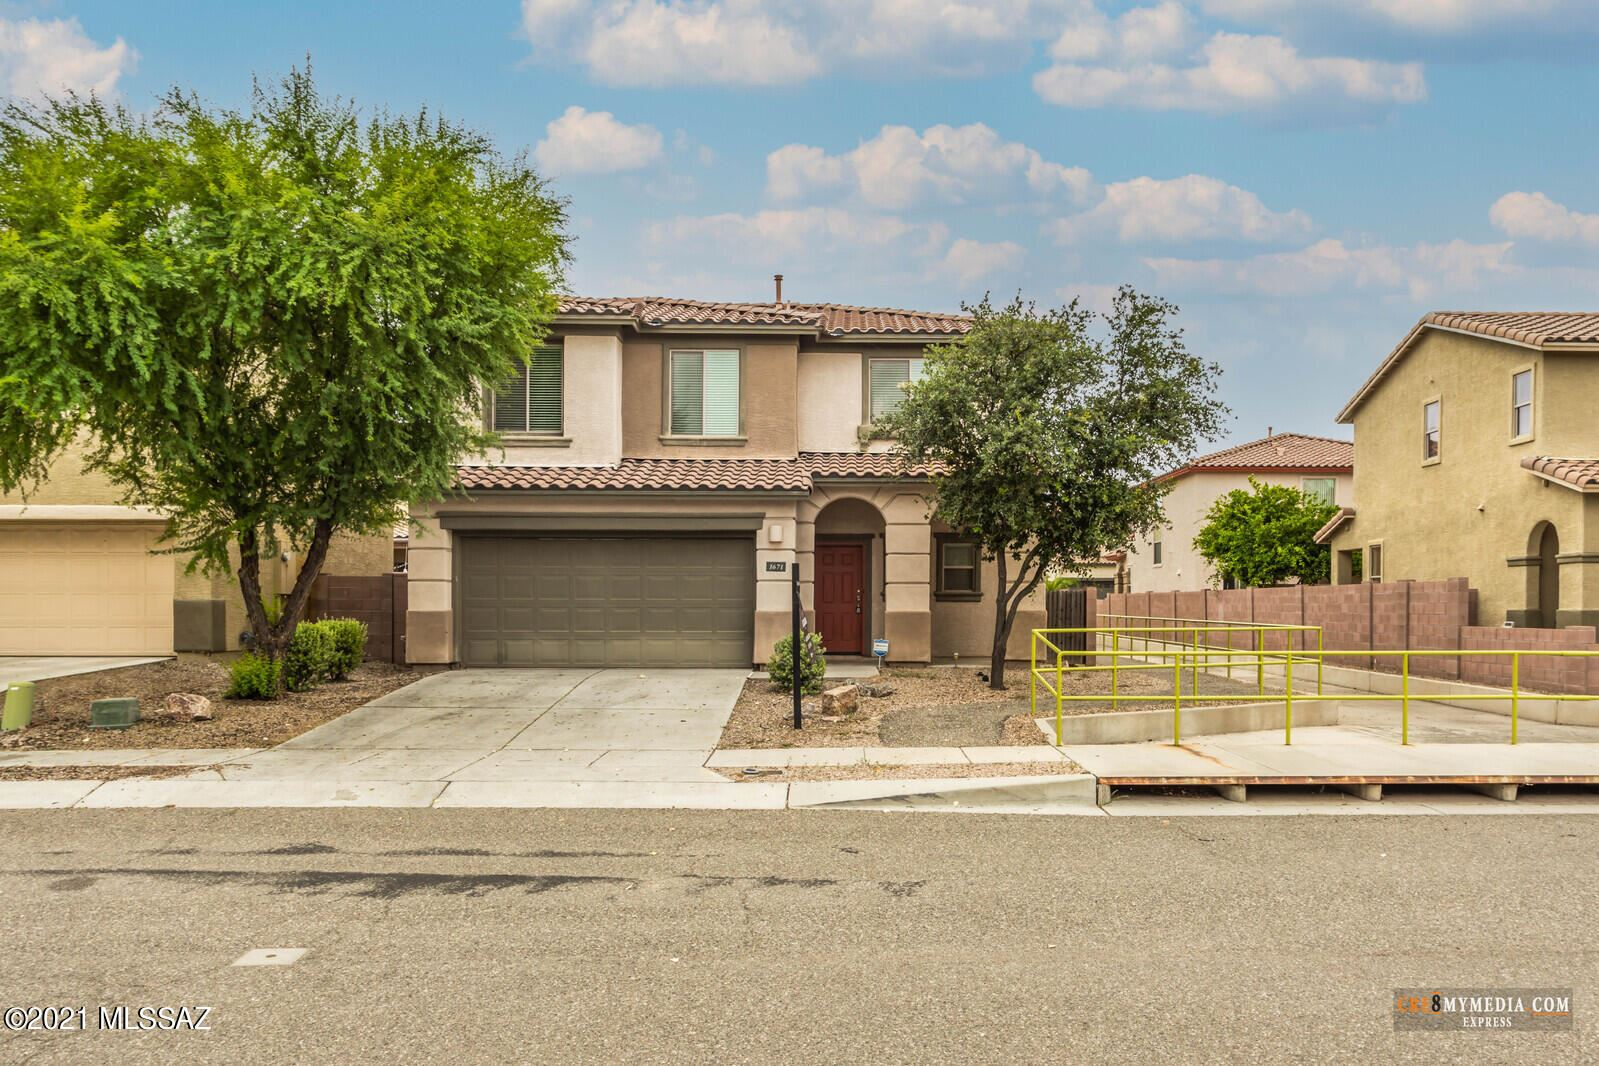 1671 W Gleaming Moon Trail, Tucson, AZ 85704 - MLS#: 22125179